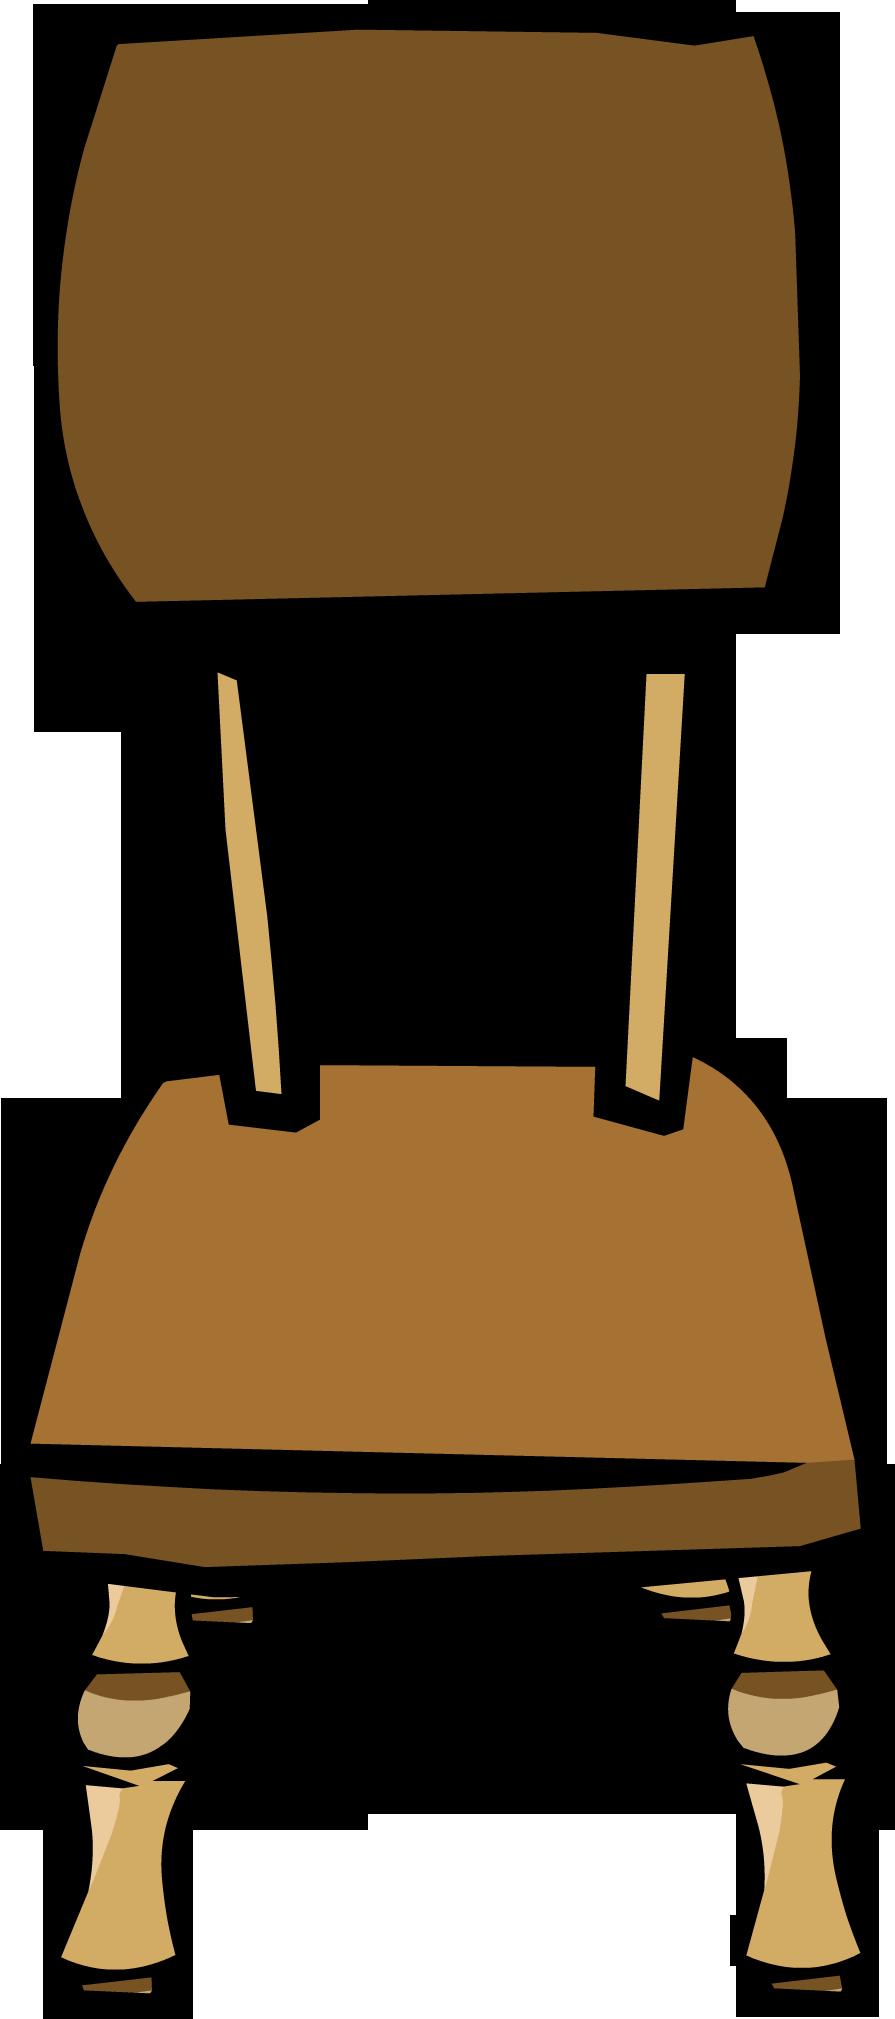 Dinner club penguin wiki. Clipart chair bamboo chair